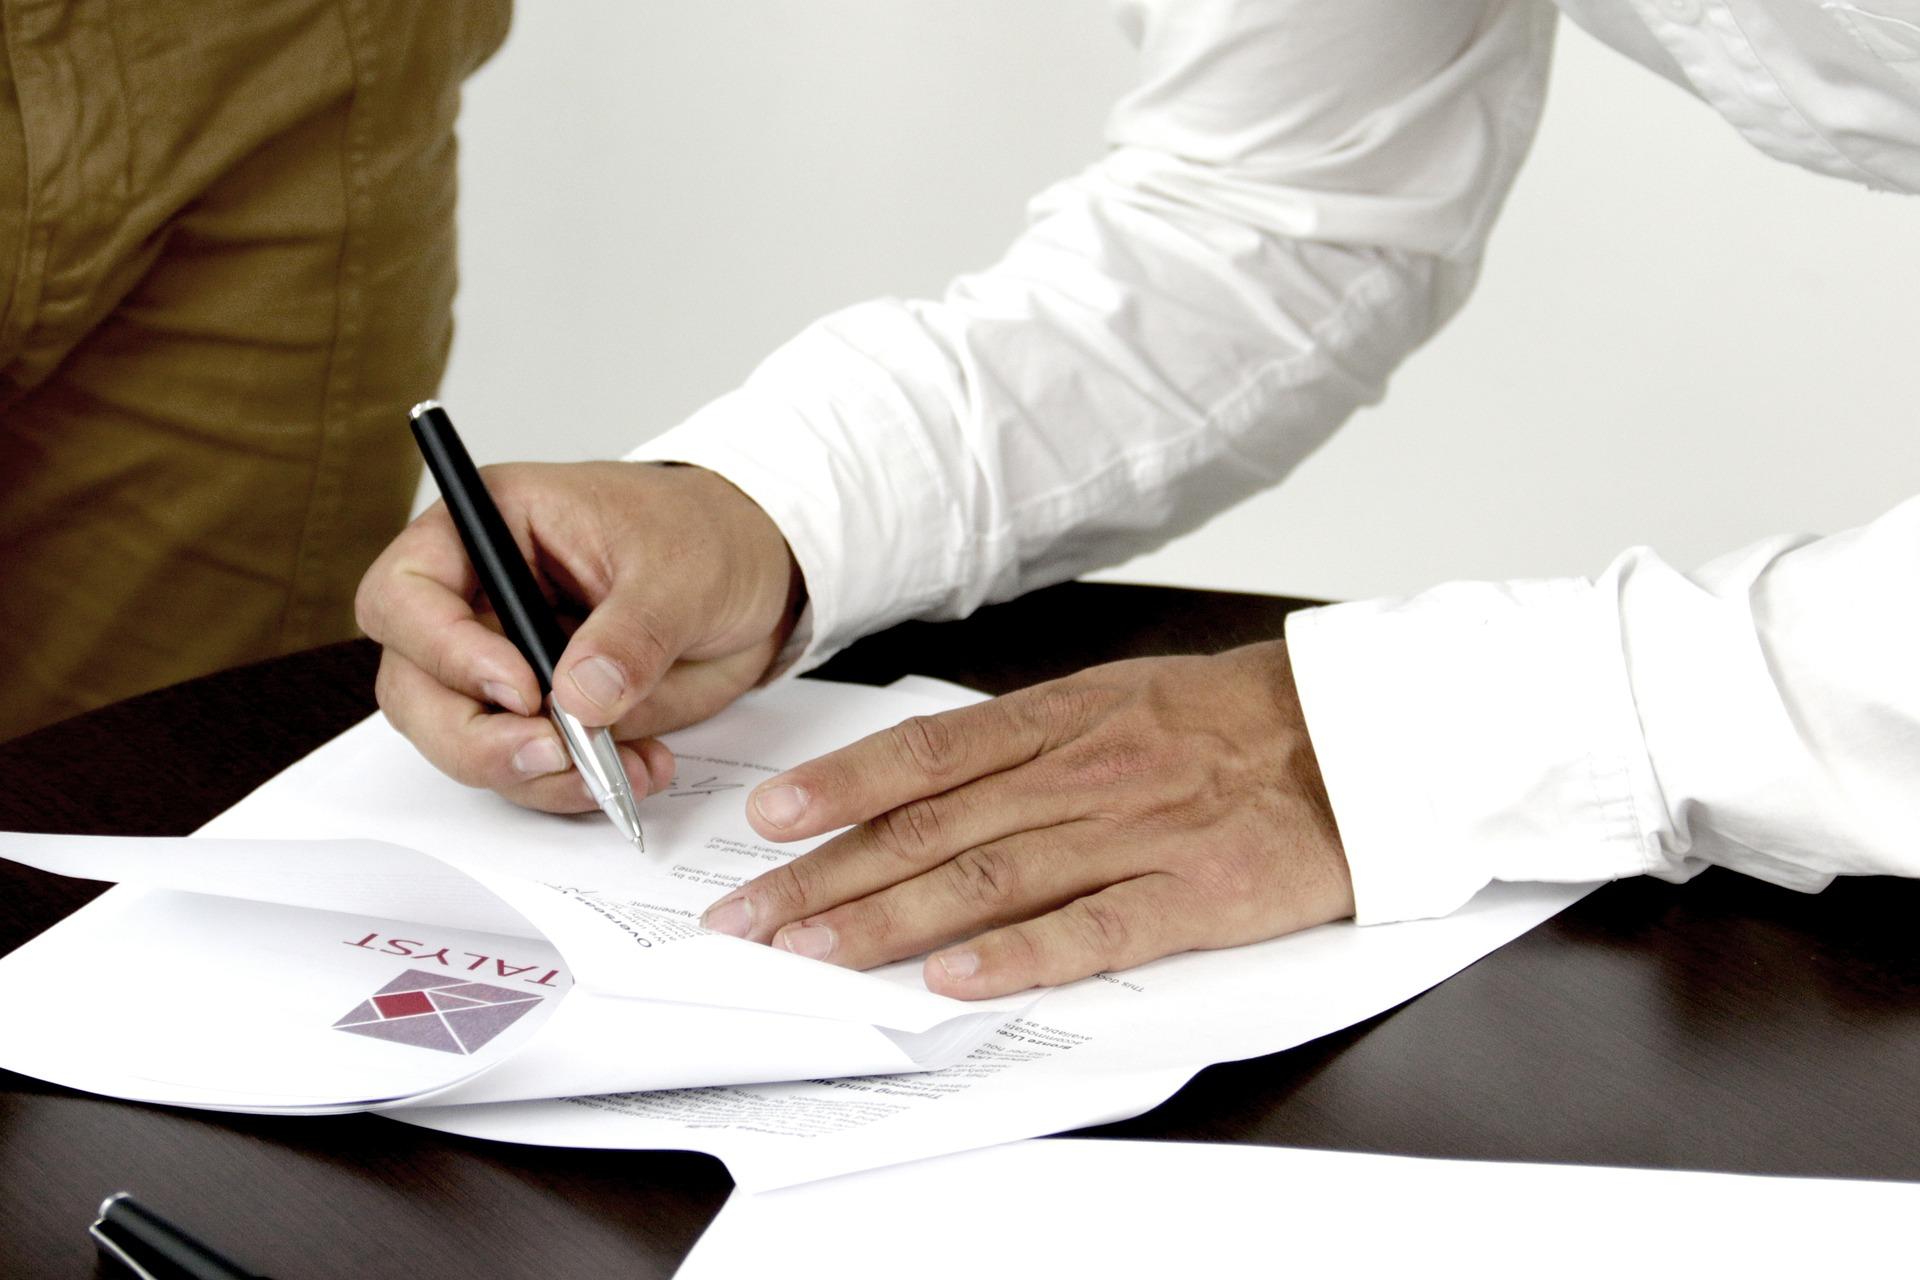 Personnes signant un contrat